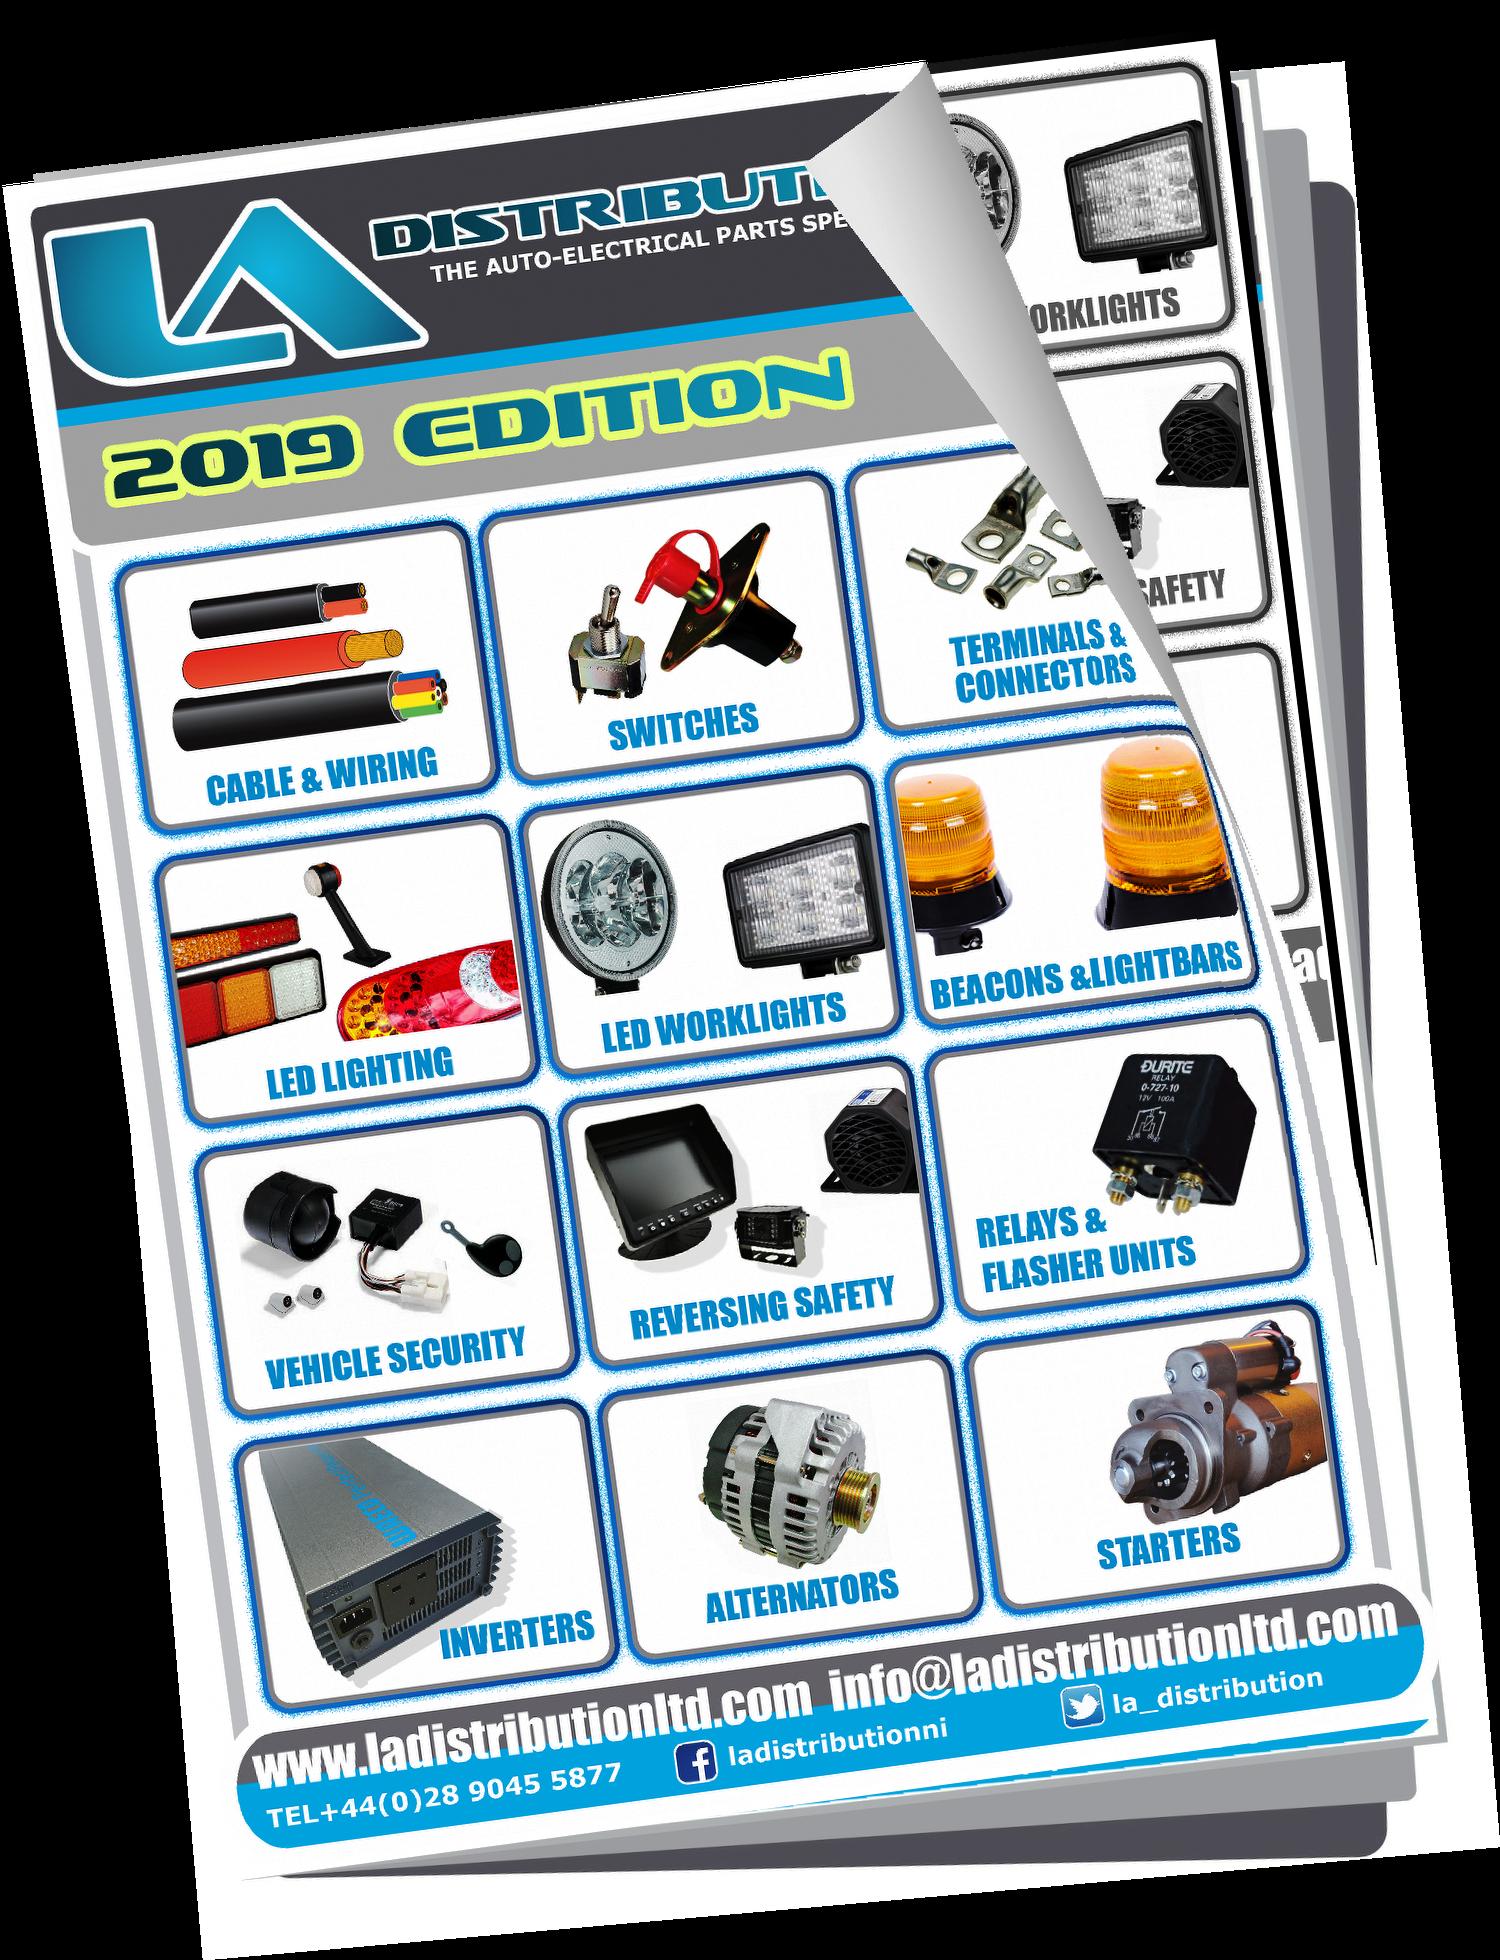 2019 product catalogue